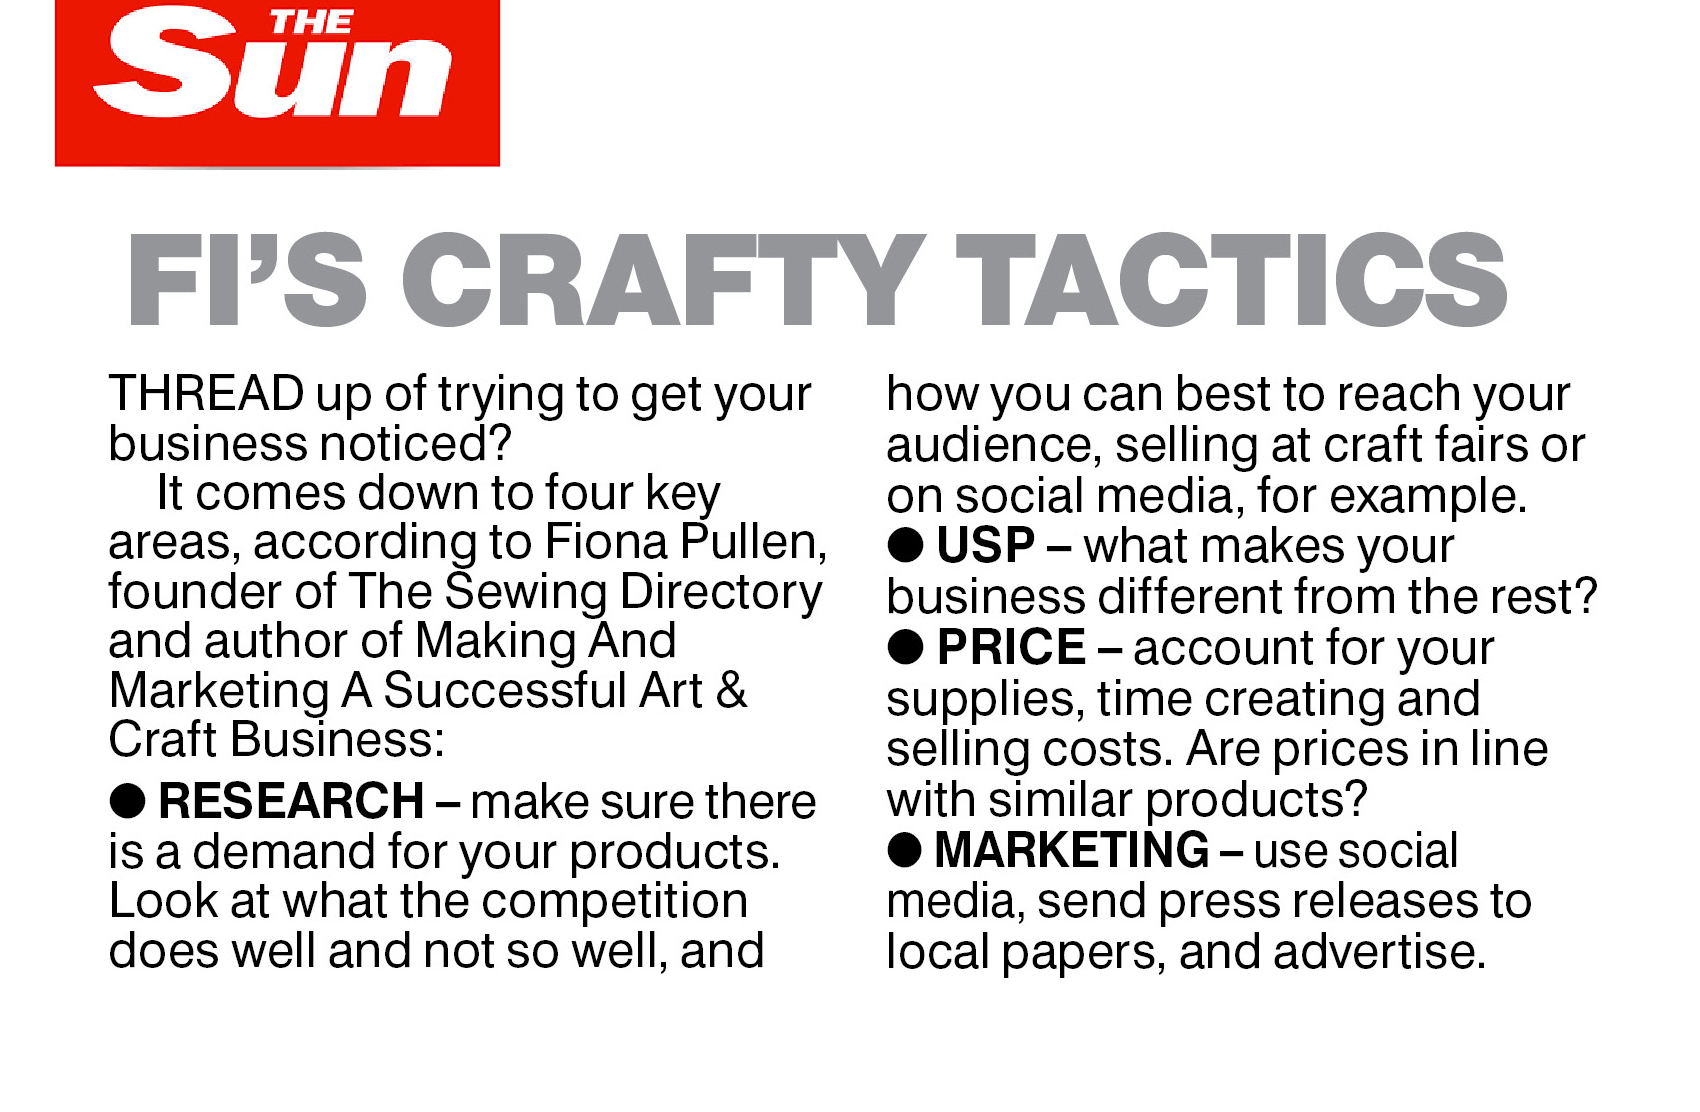 Search Press | Making & Marketing a Successful Art & Craft